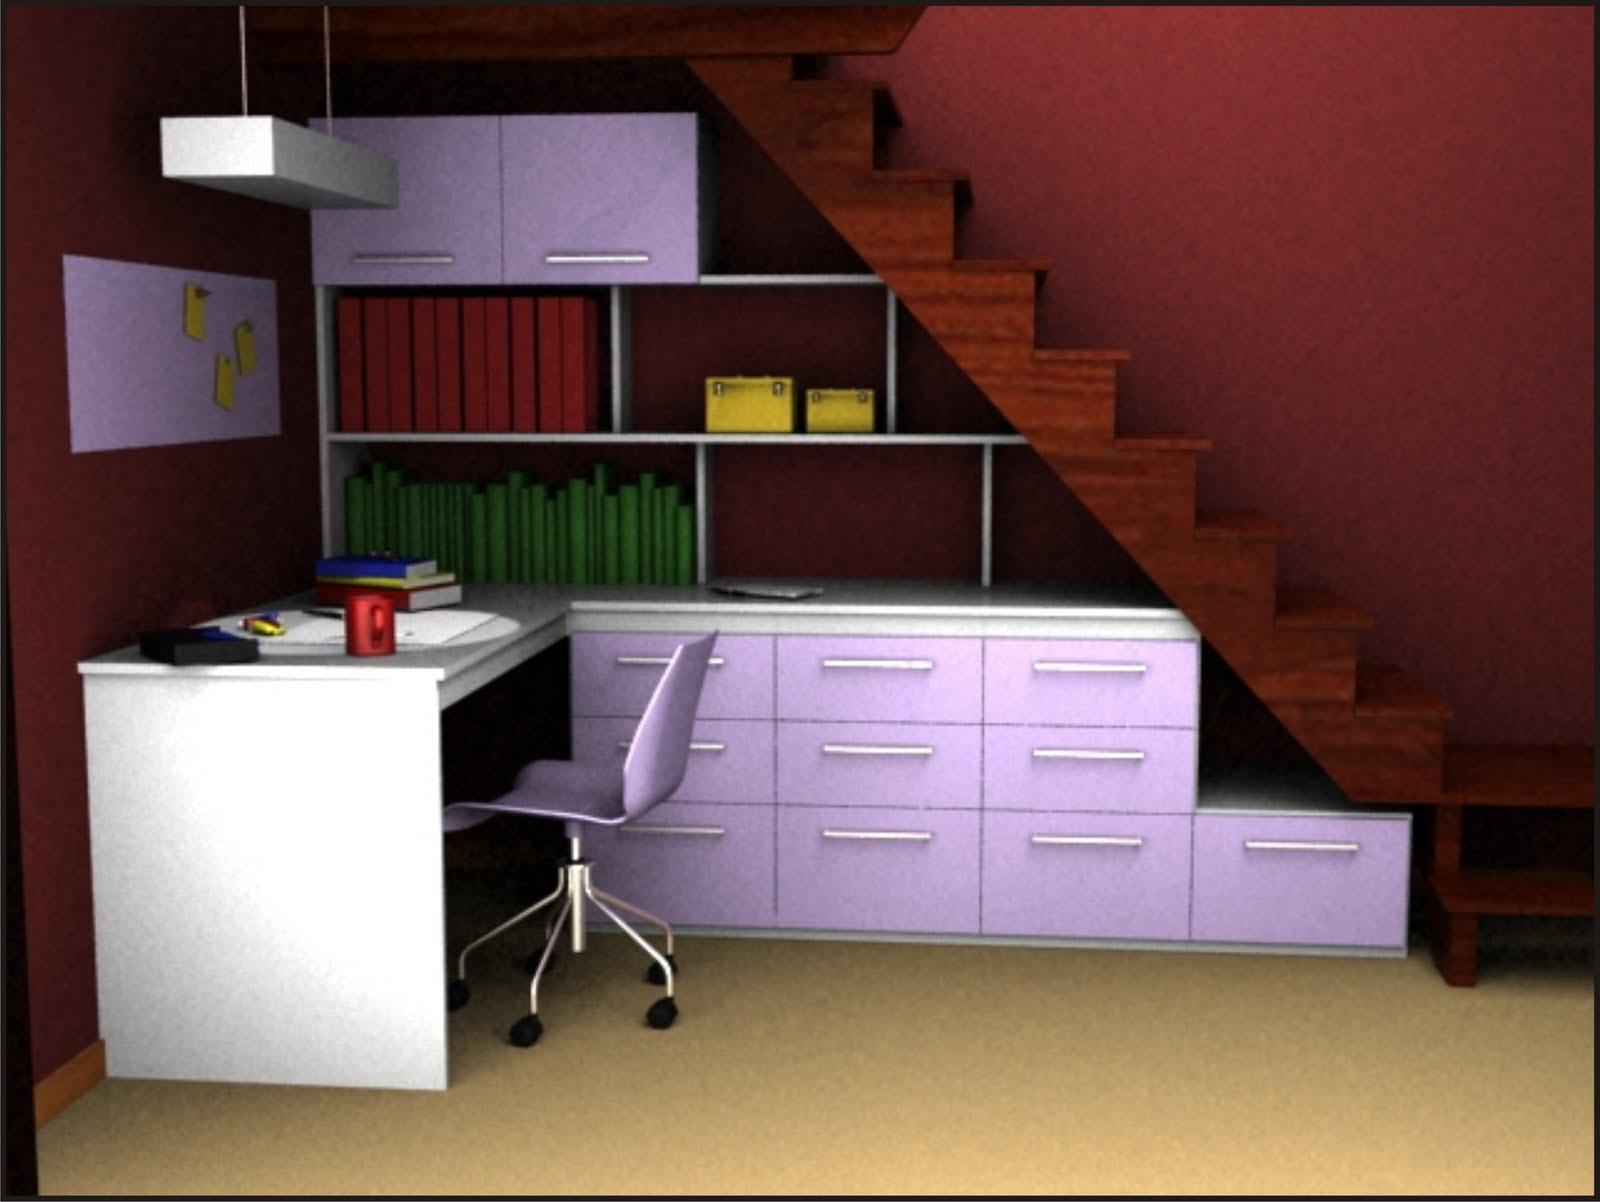 Grupo impronta dise o biblioteca escritorio para habitaci n - Escritorio para habitacion ...